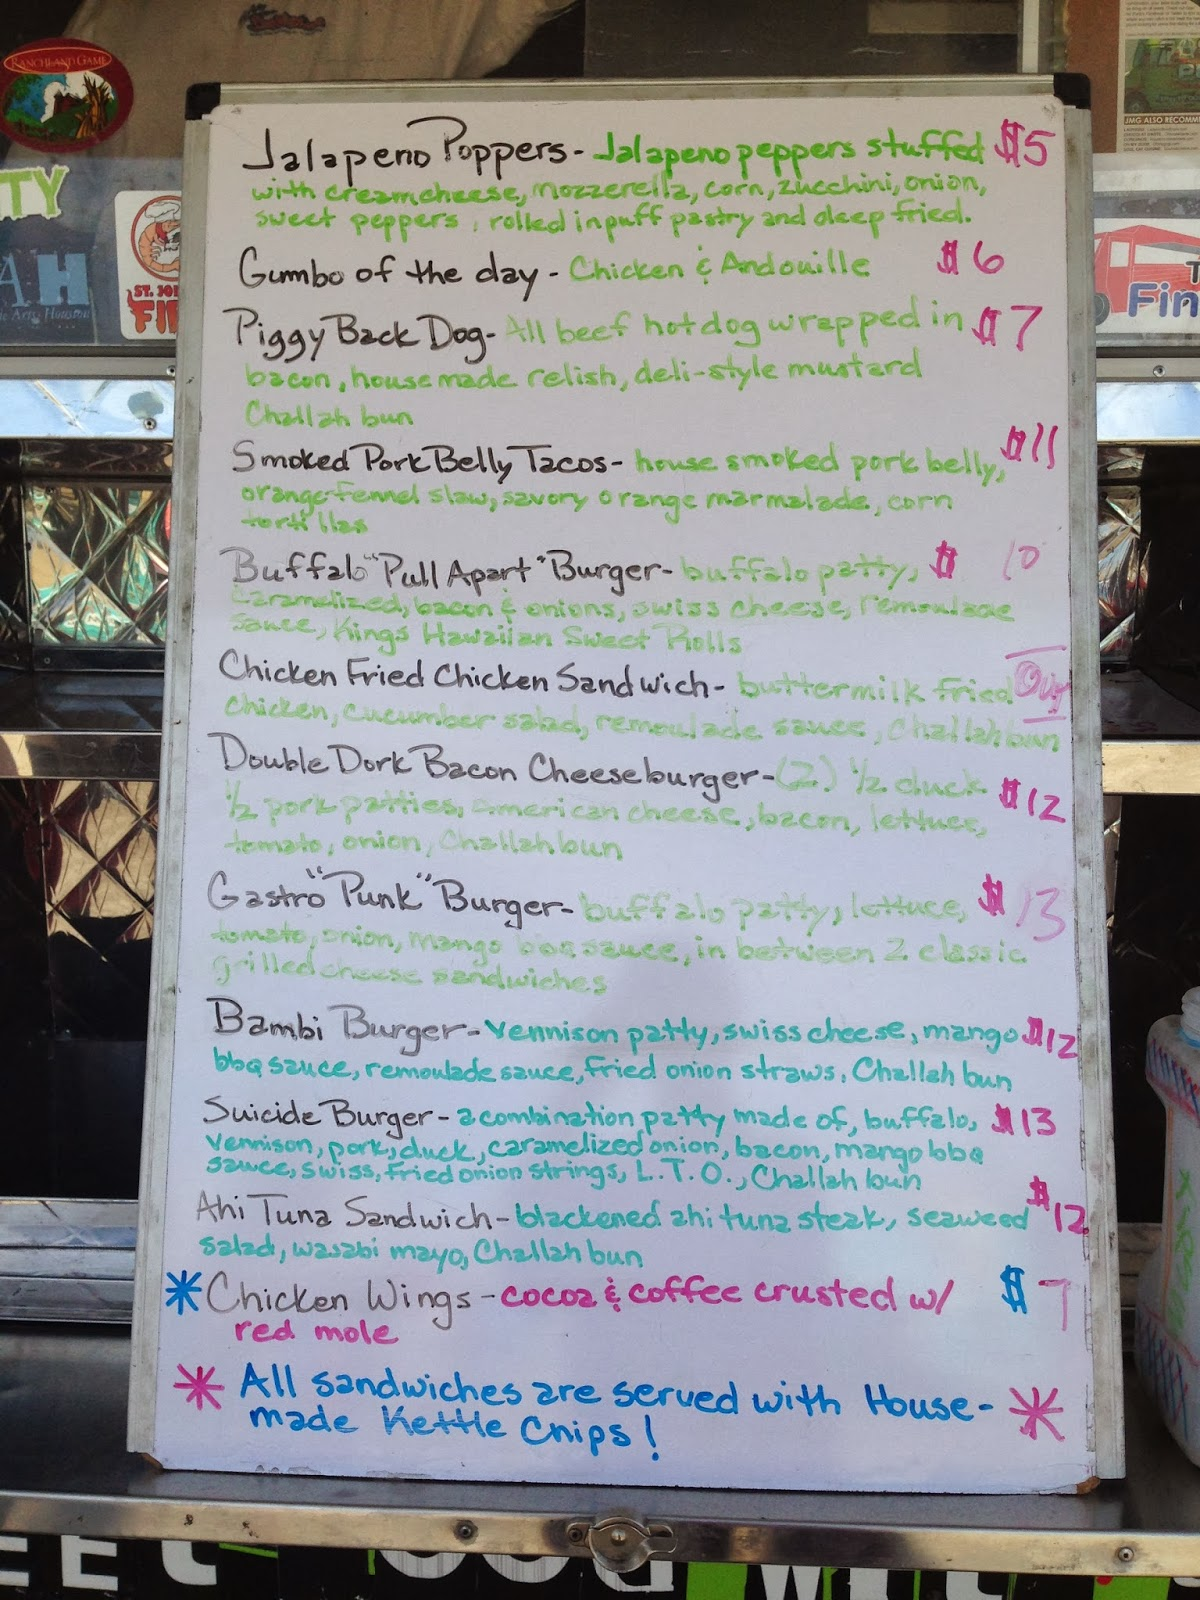 Gastro Punk Food Truck, Houston, TX - Menu